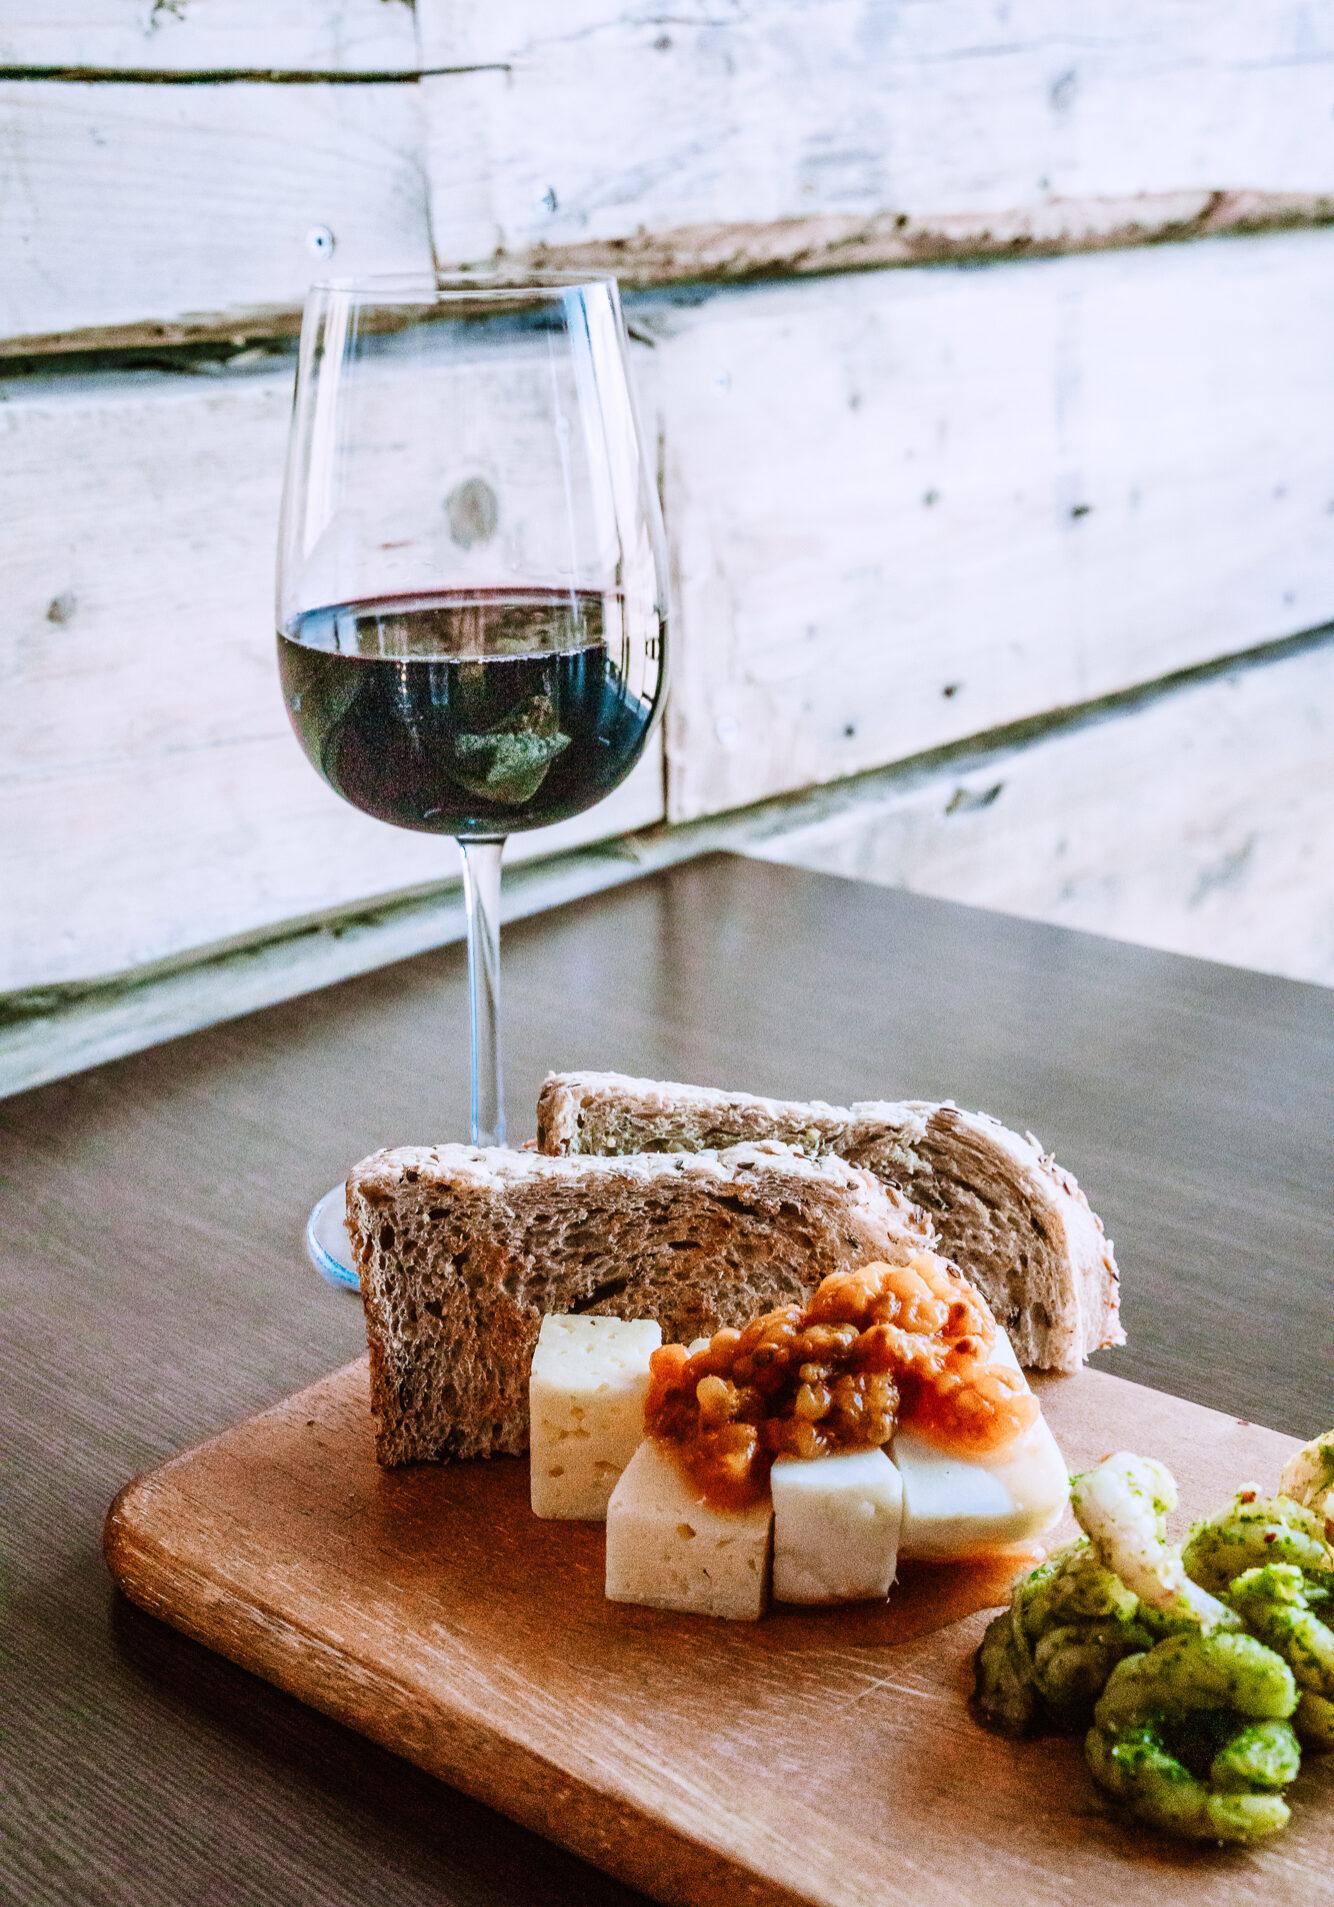 Salteriet restaurant by Mefjord Brygge-20